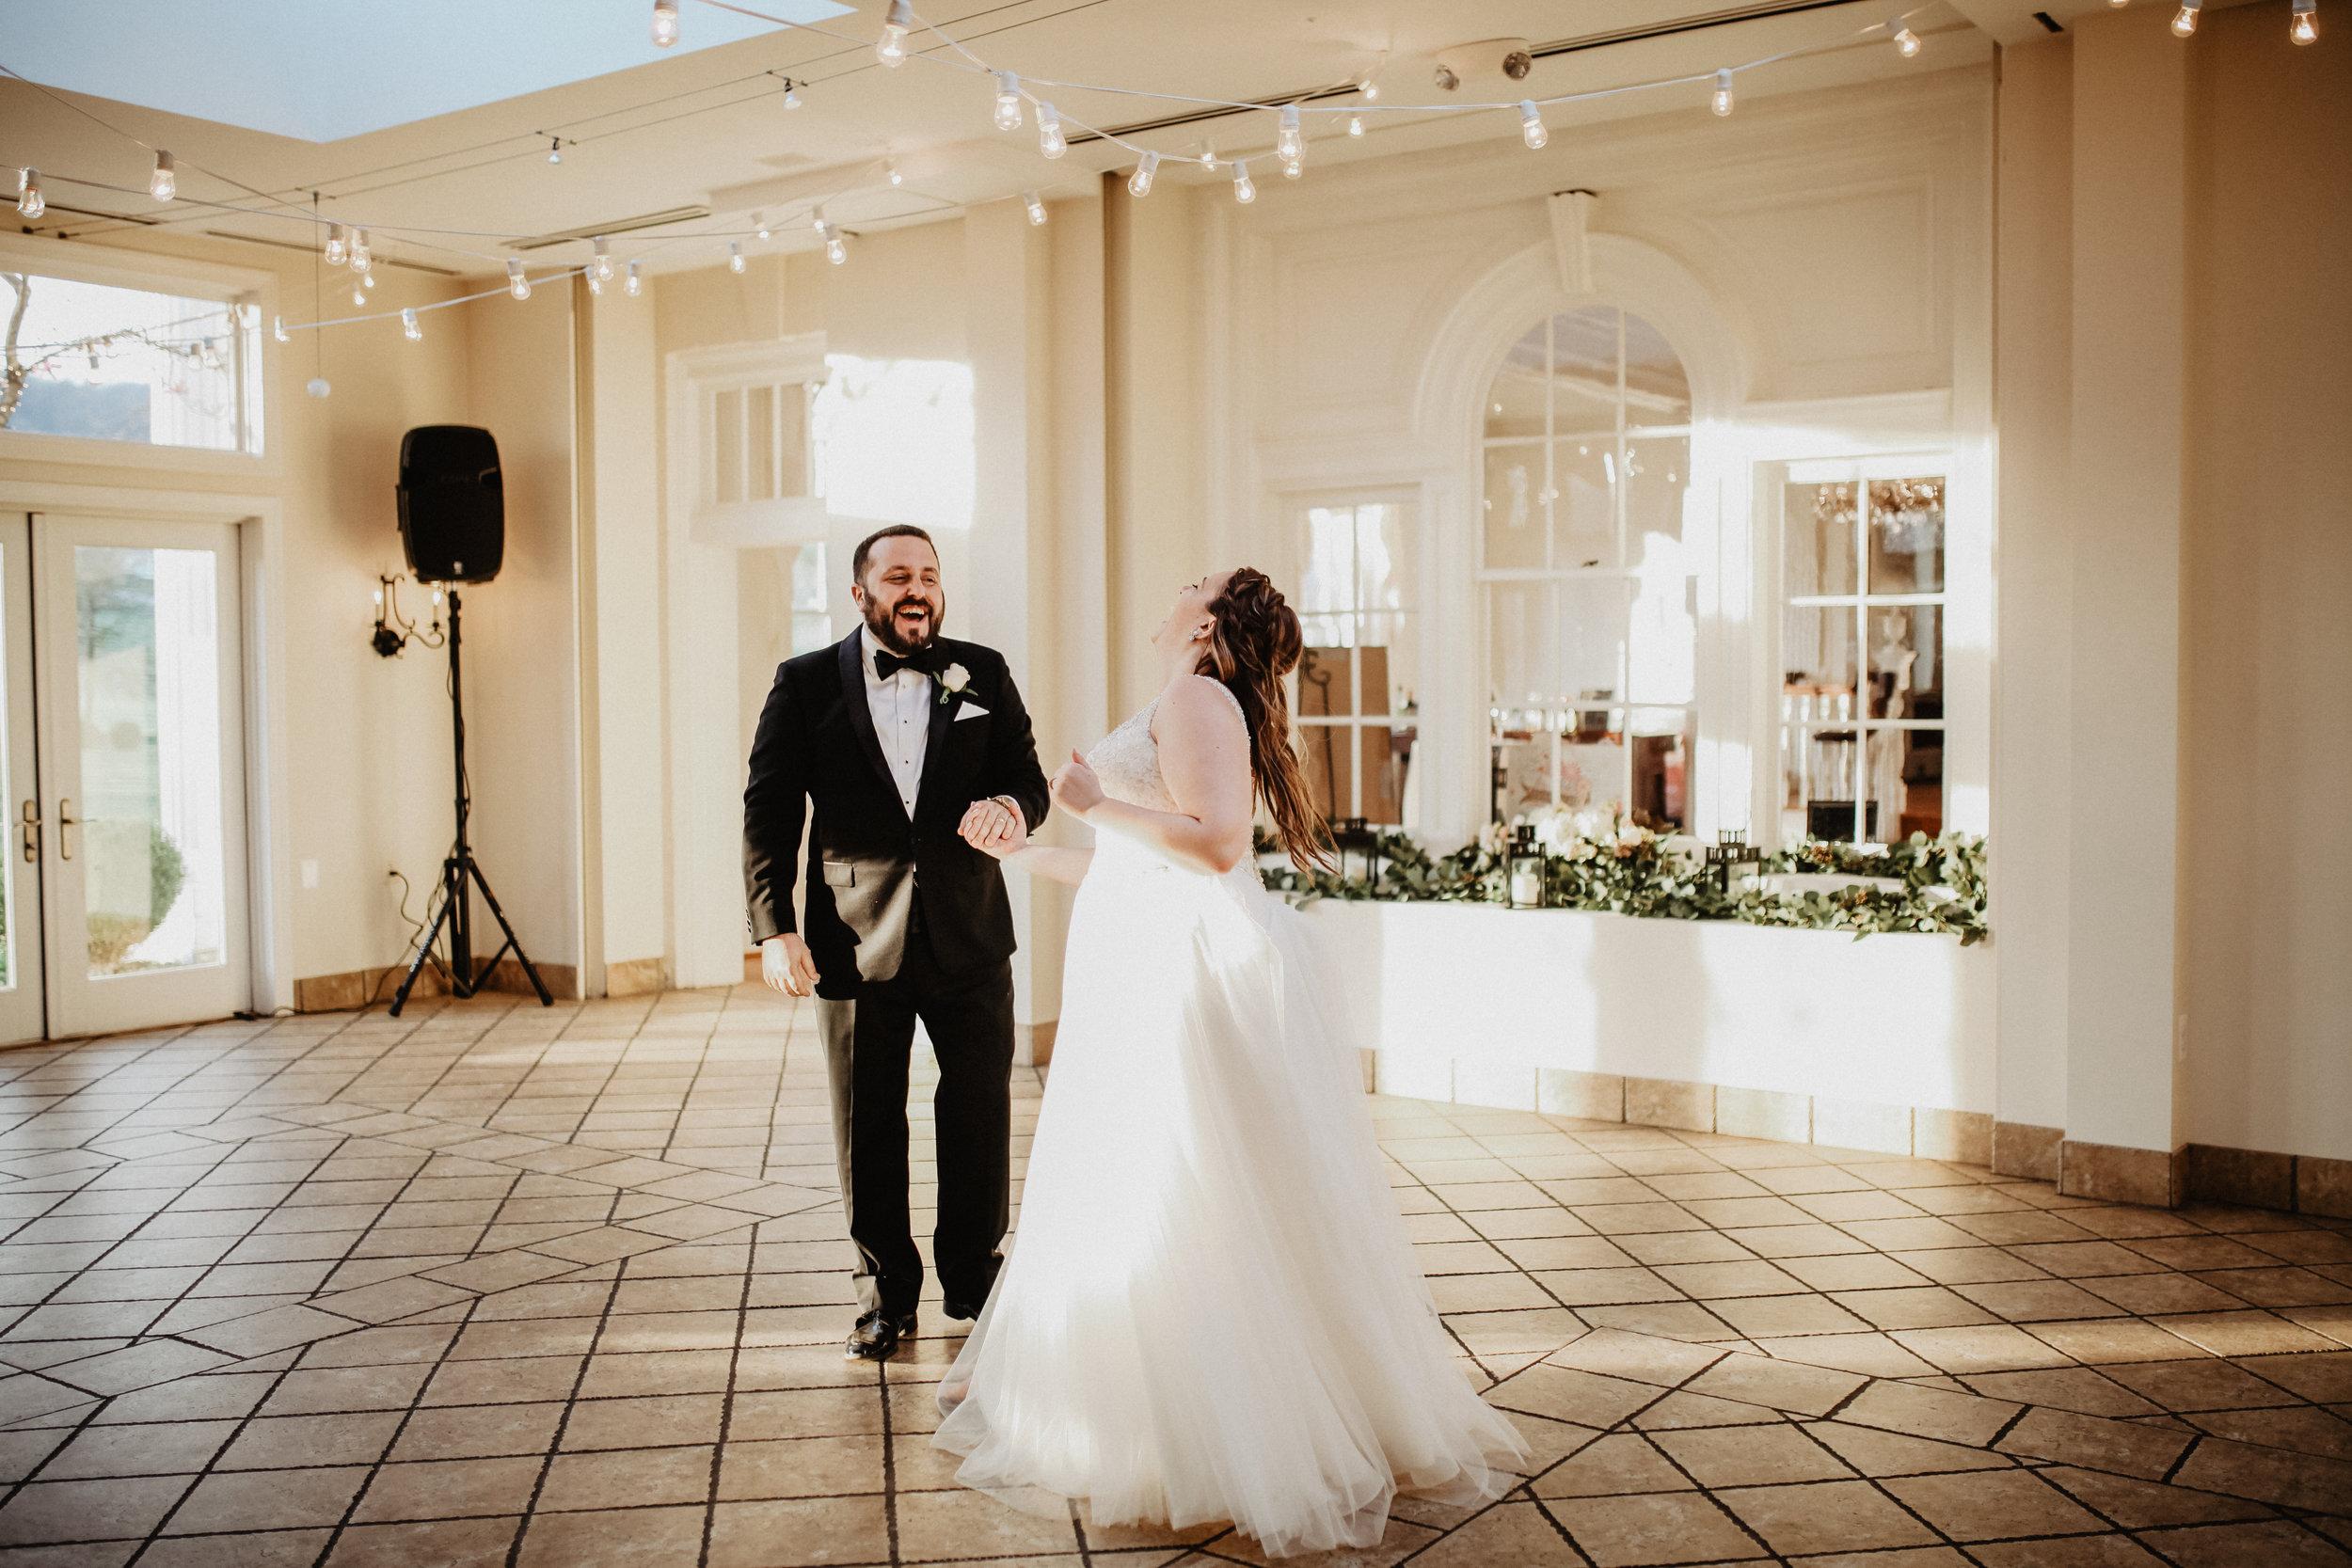 AnthonyKyndra_Married_2018-436.jpg